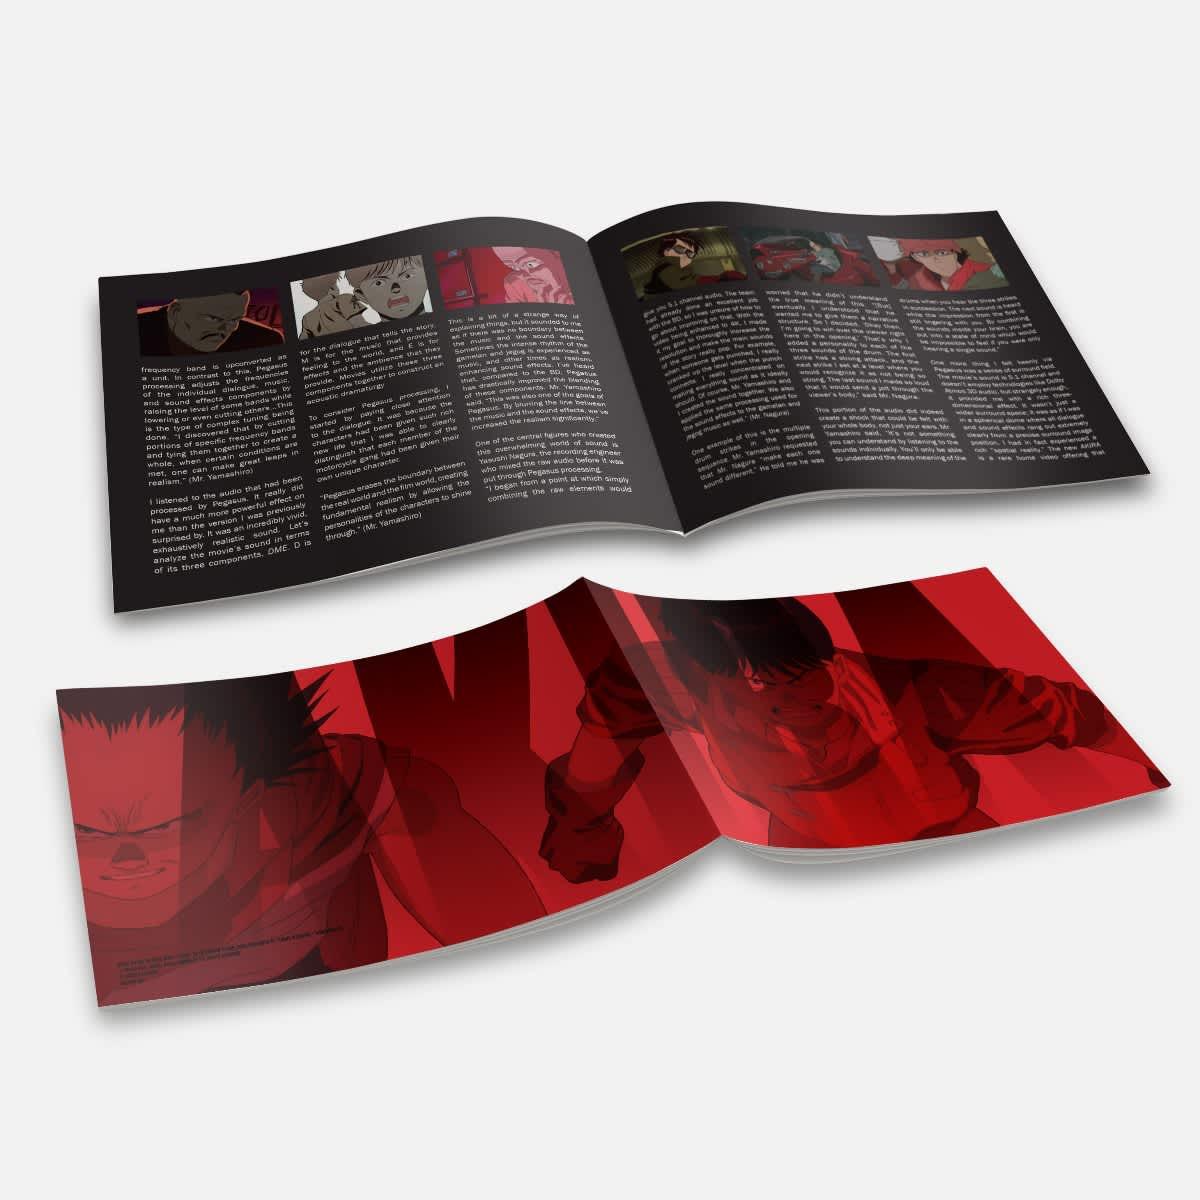 Wario64 On Twitter Akira 35th Anniversary Manga Box Set Is 149 99 On Amazon 2530 Pages Https T Co Oiocc5bkd5